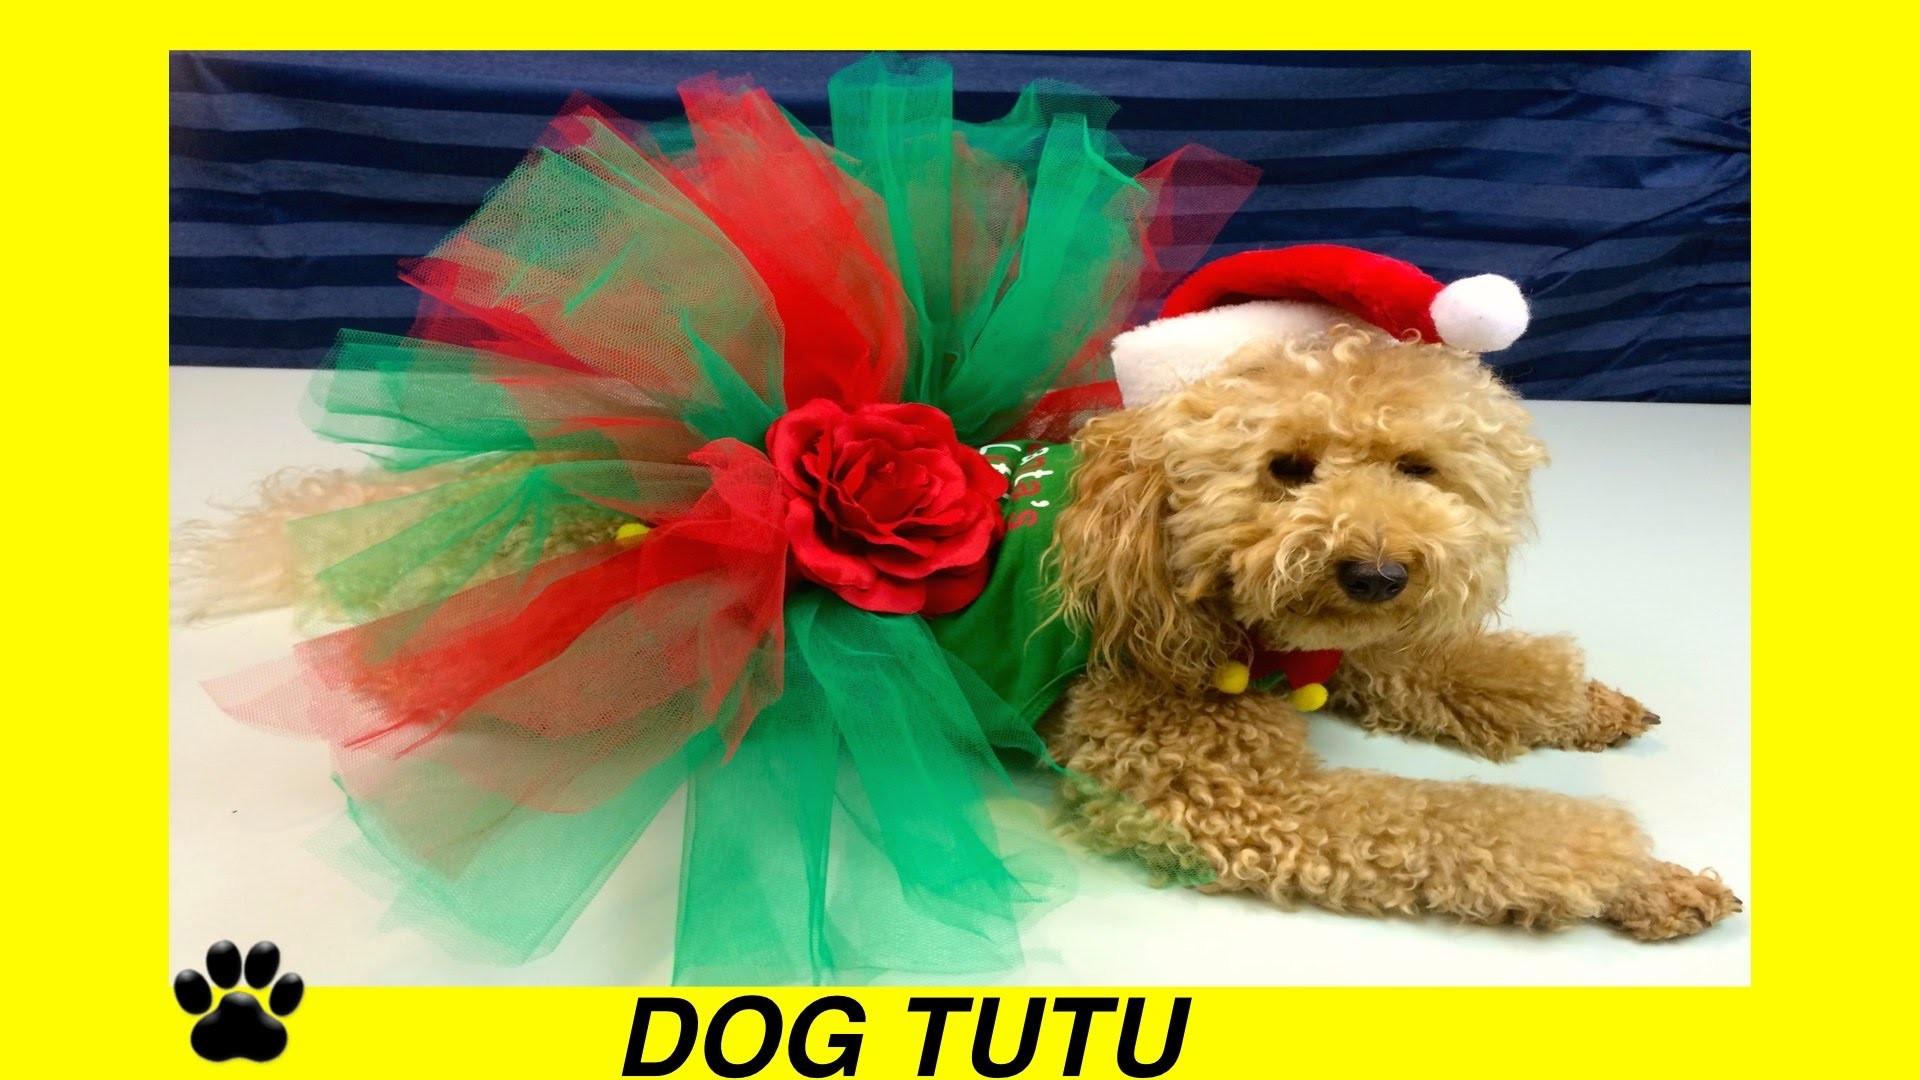 CHRISTMAS DOG TUTU SKIRT- XMAS FESTIVE DRESS - DIY Dog Craft by Cooking For Dogs